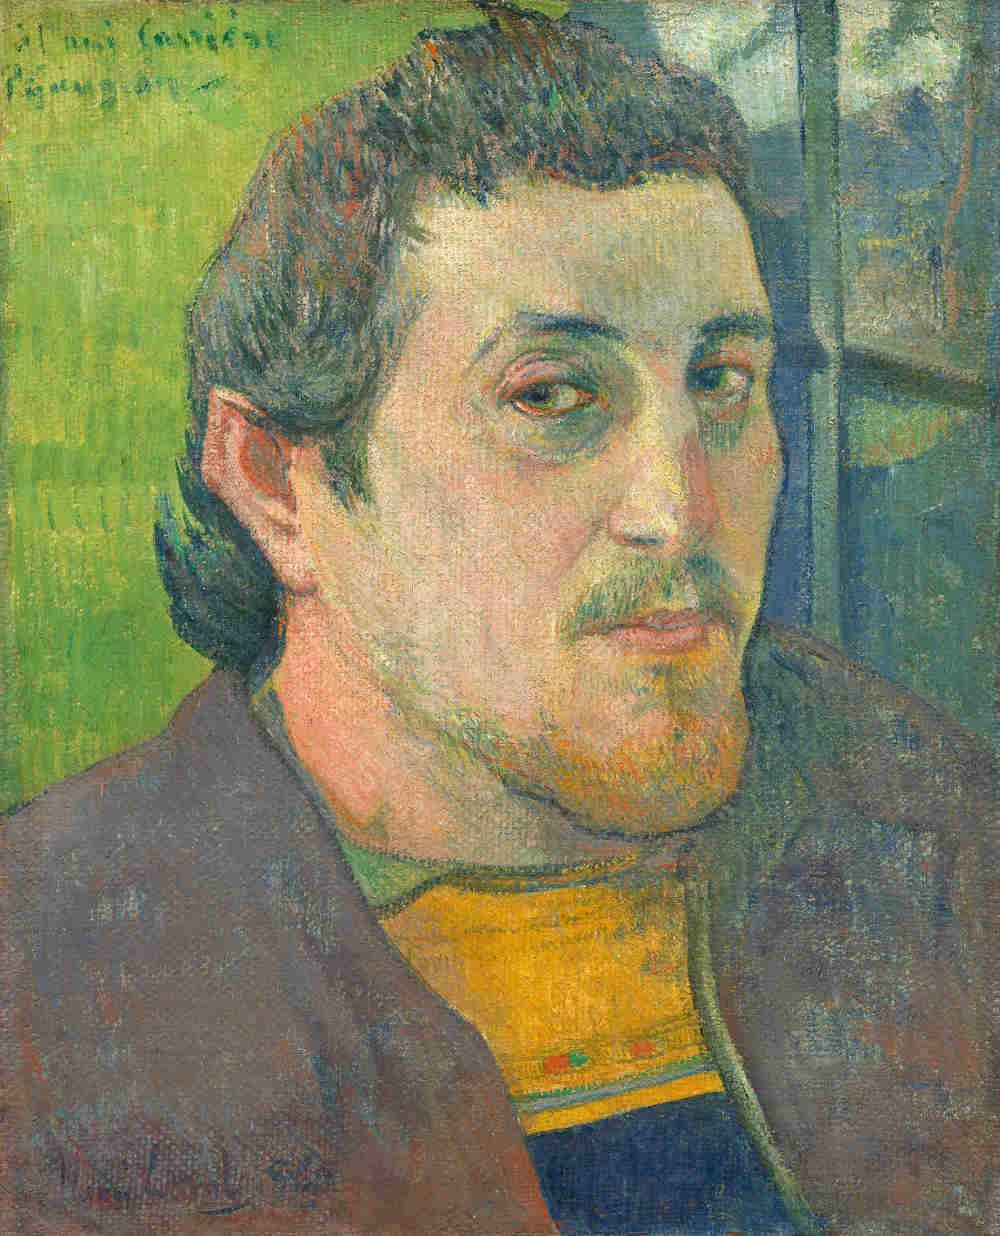 Best Art Exhibitions 2019, Gauguin Portraits, National Gallery